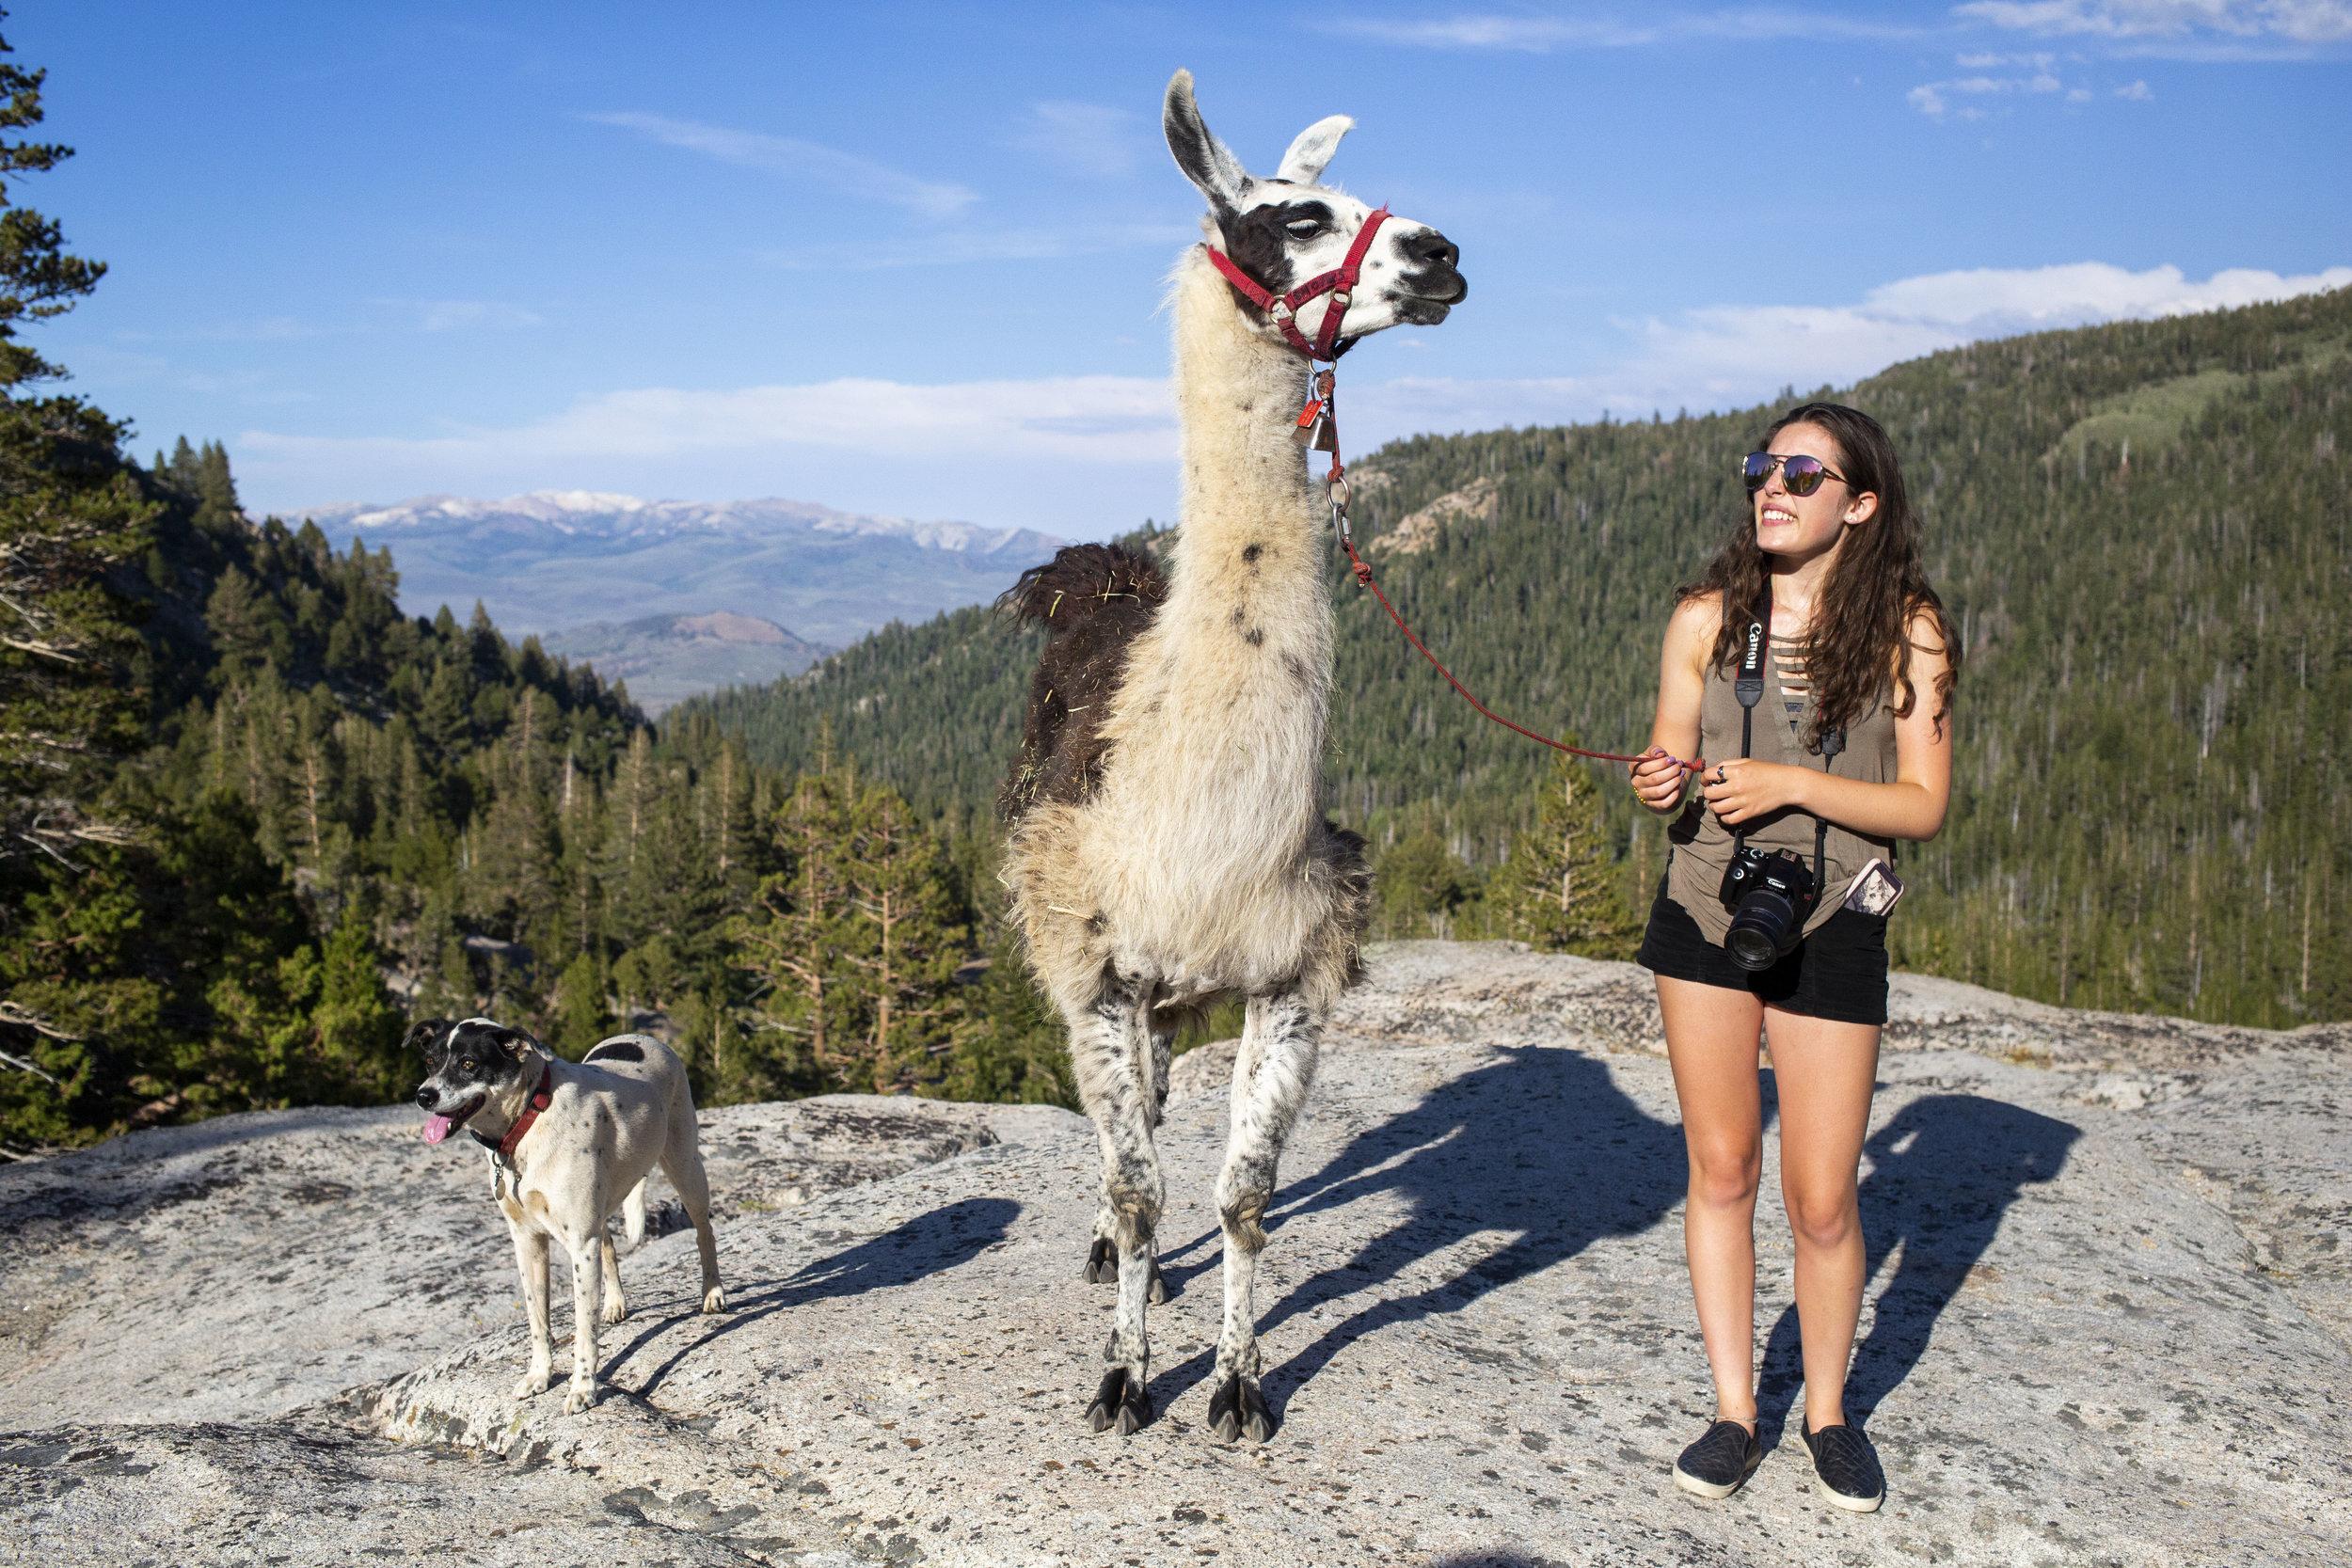 NGSE_Yosemite2018_AnnaLynch_5093.jpg